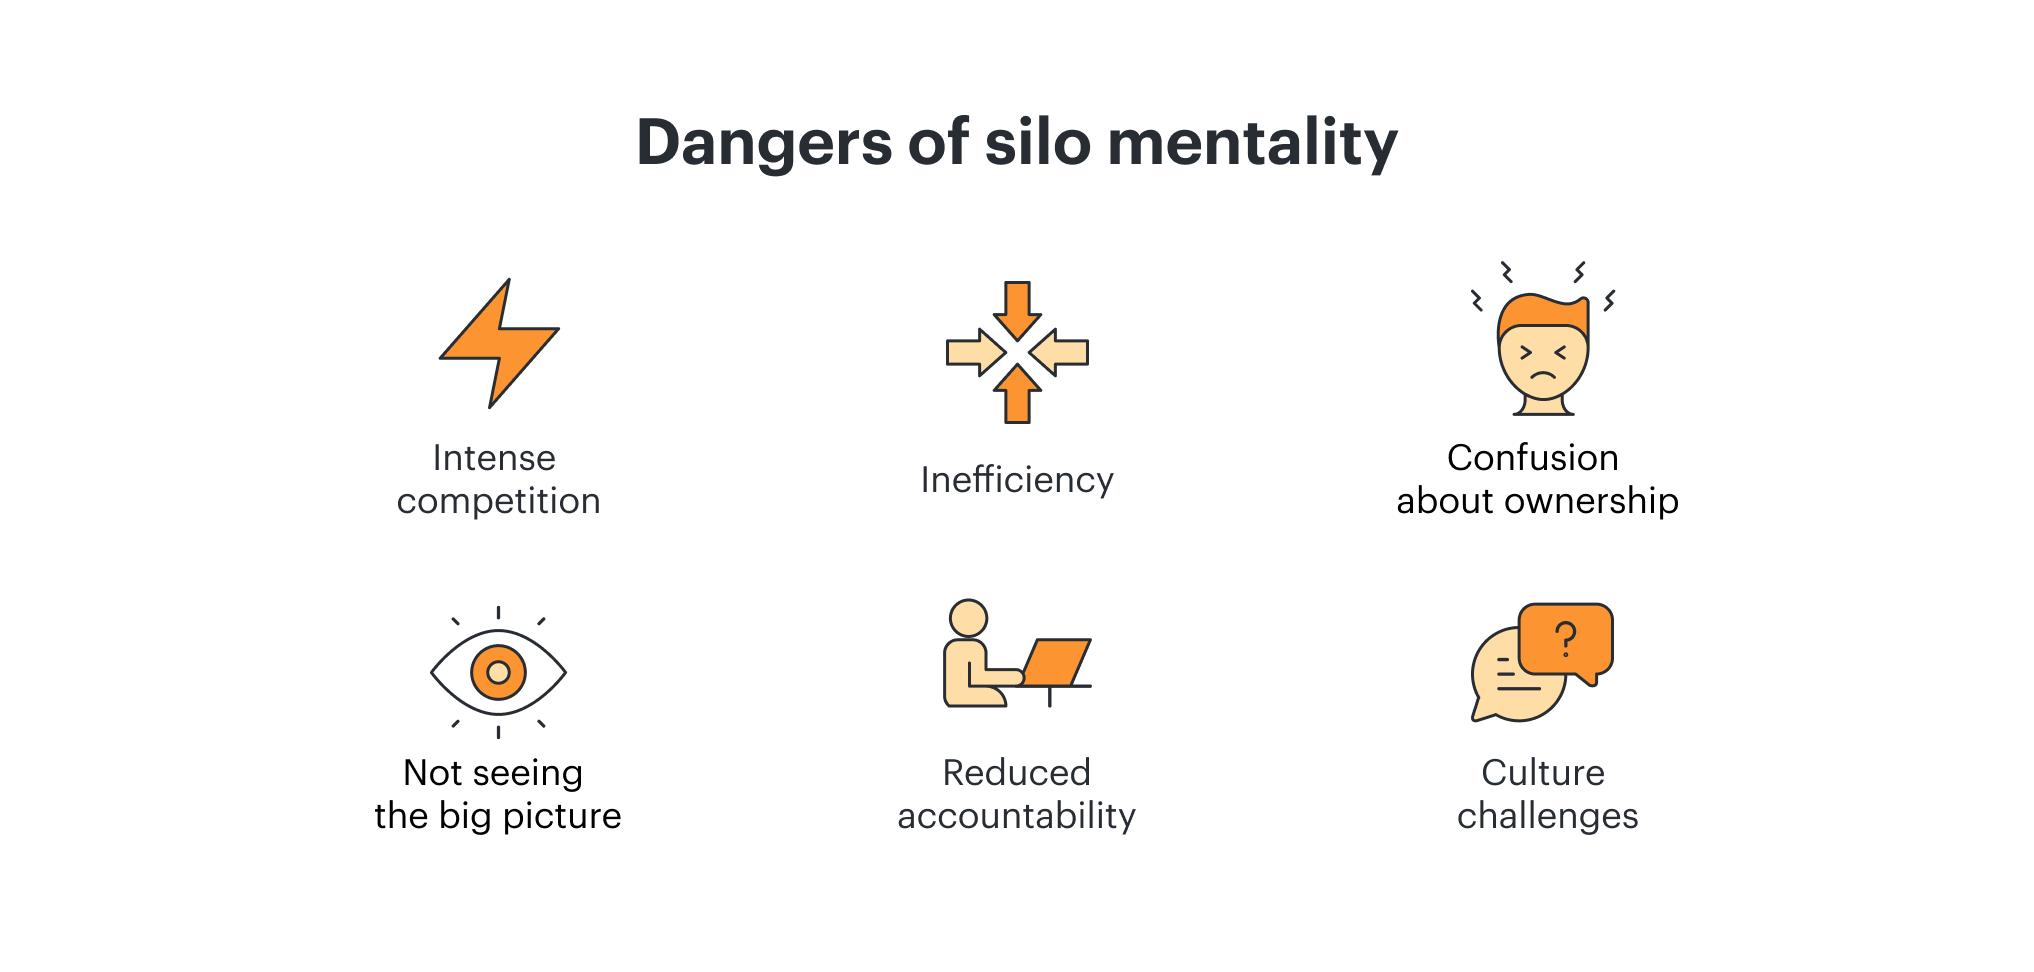 silo mentality